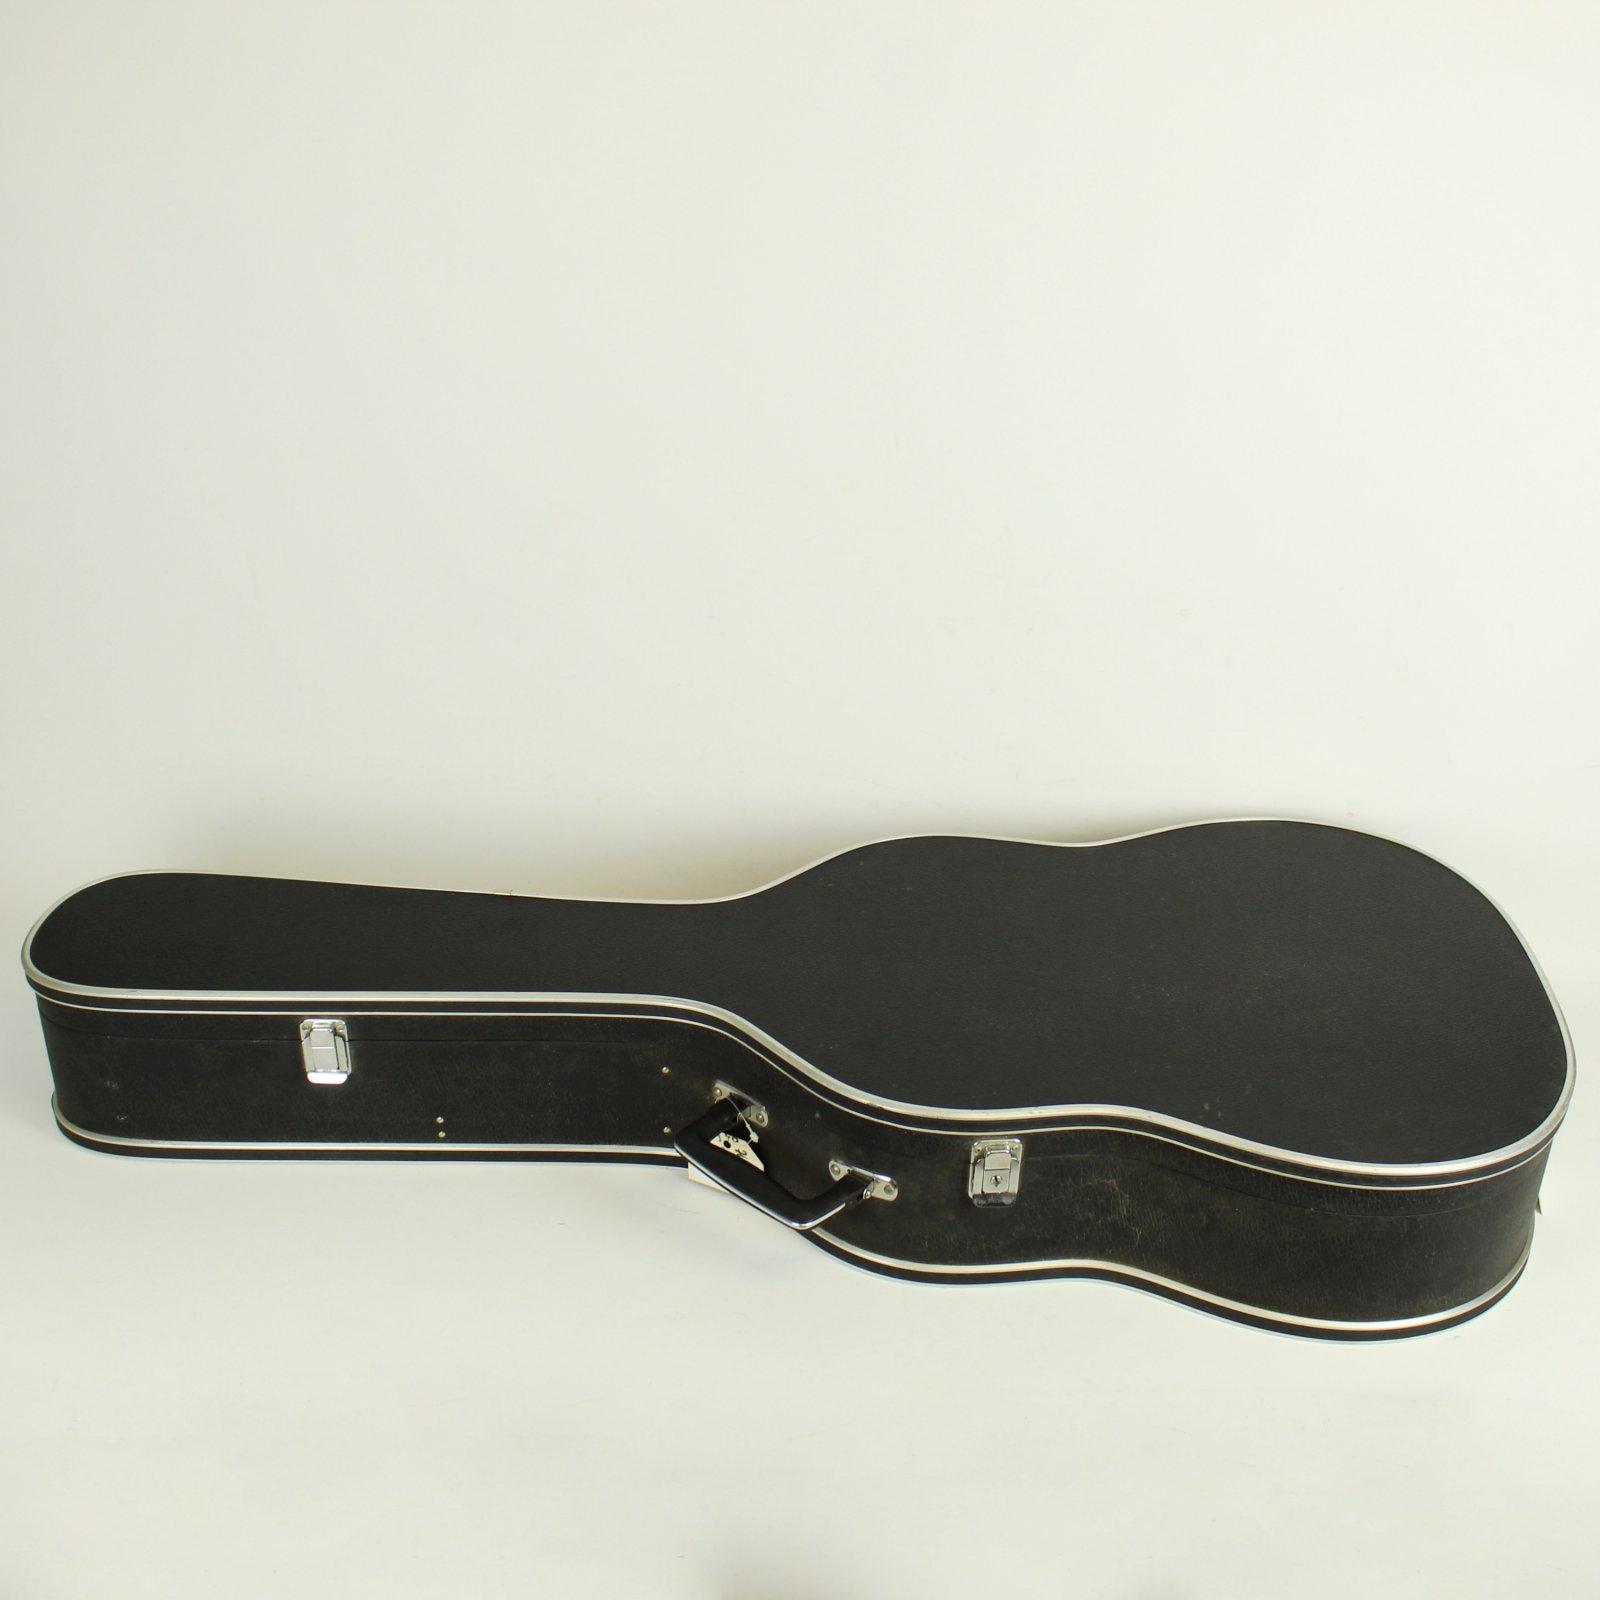 Vintage Hardshell Case for Concert Acoustic Guitar (USED)